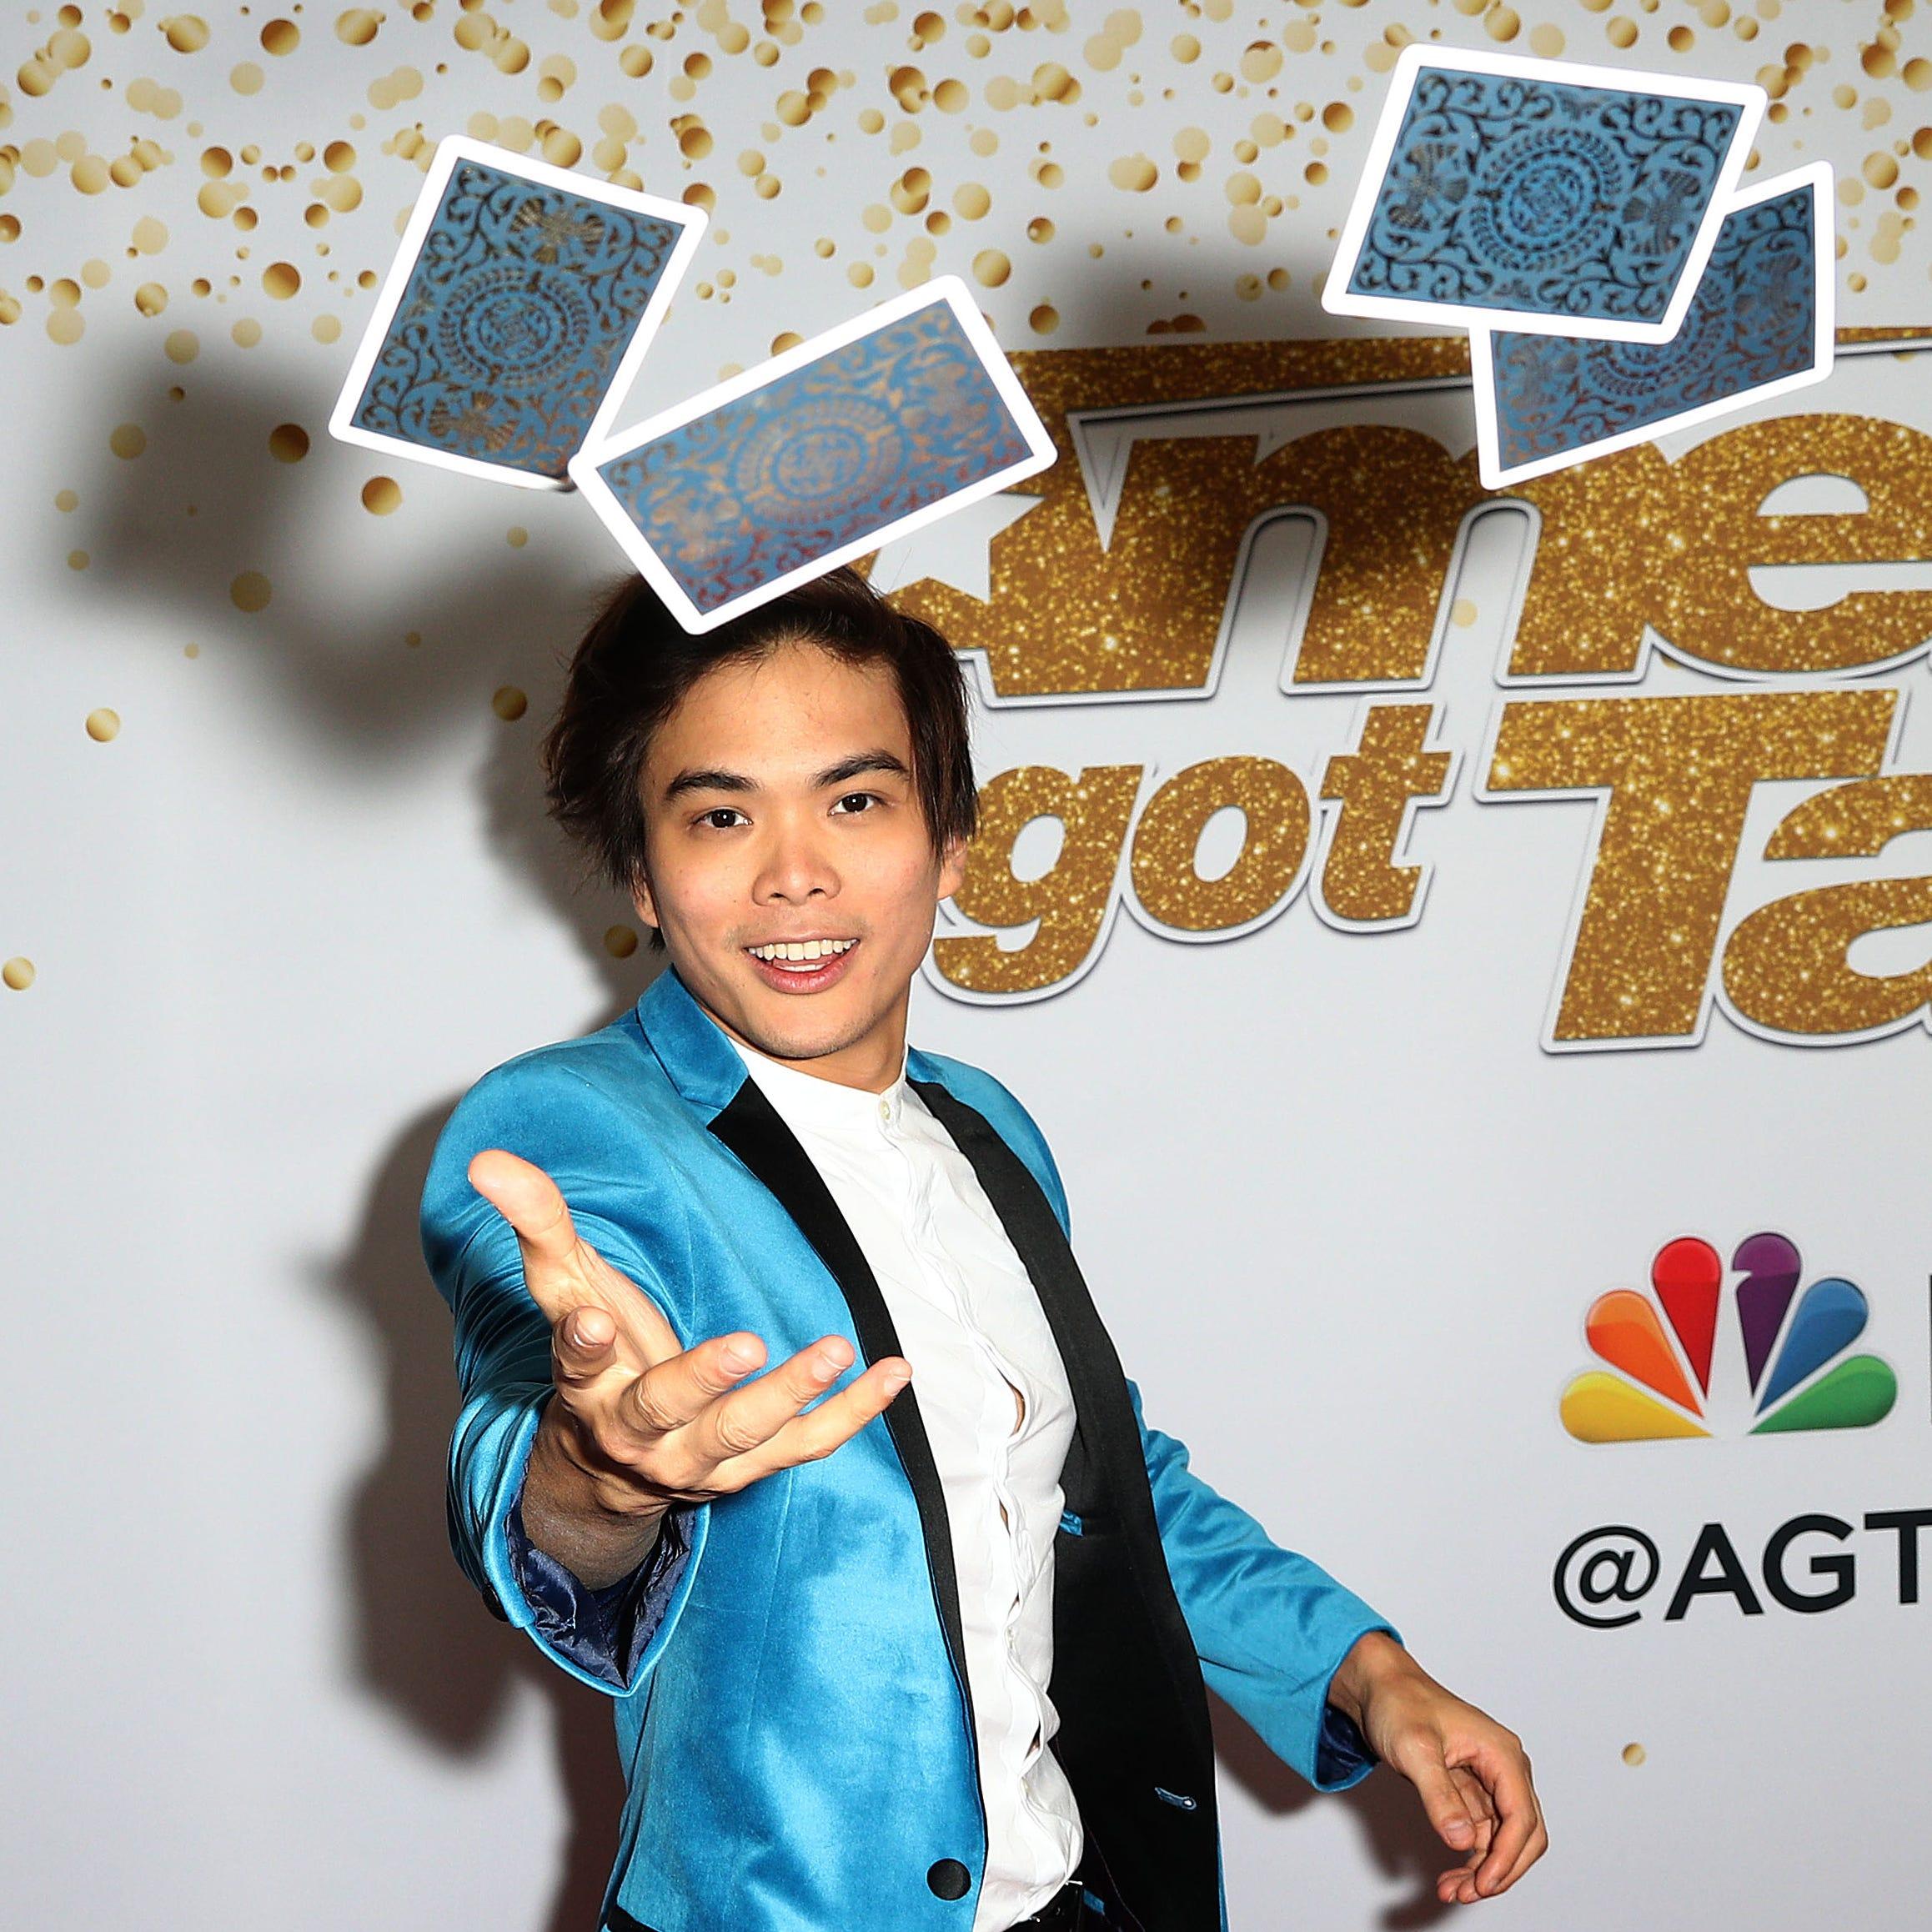 'America's Got Talent': Courtney Hadwin, Zurcaroh fans not happy about winner Shin Lim